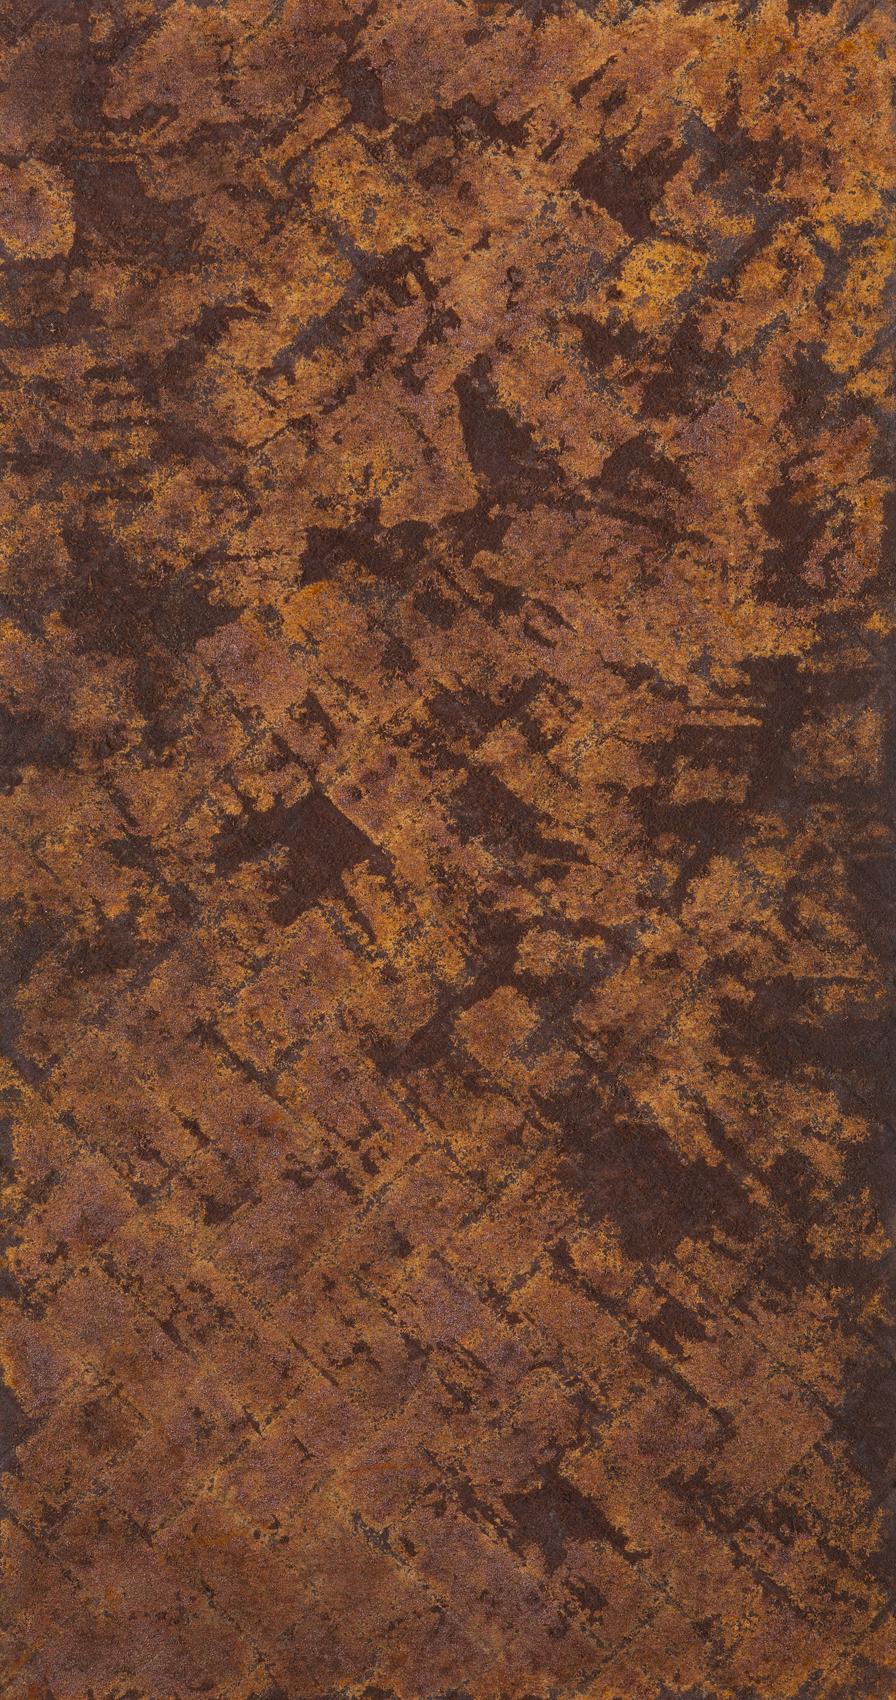 Untitled, 2016, Steel wool and rust on plywood, 150x80 cm (2).jpg